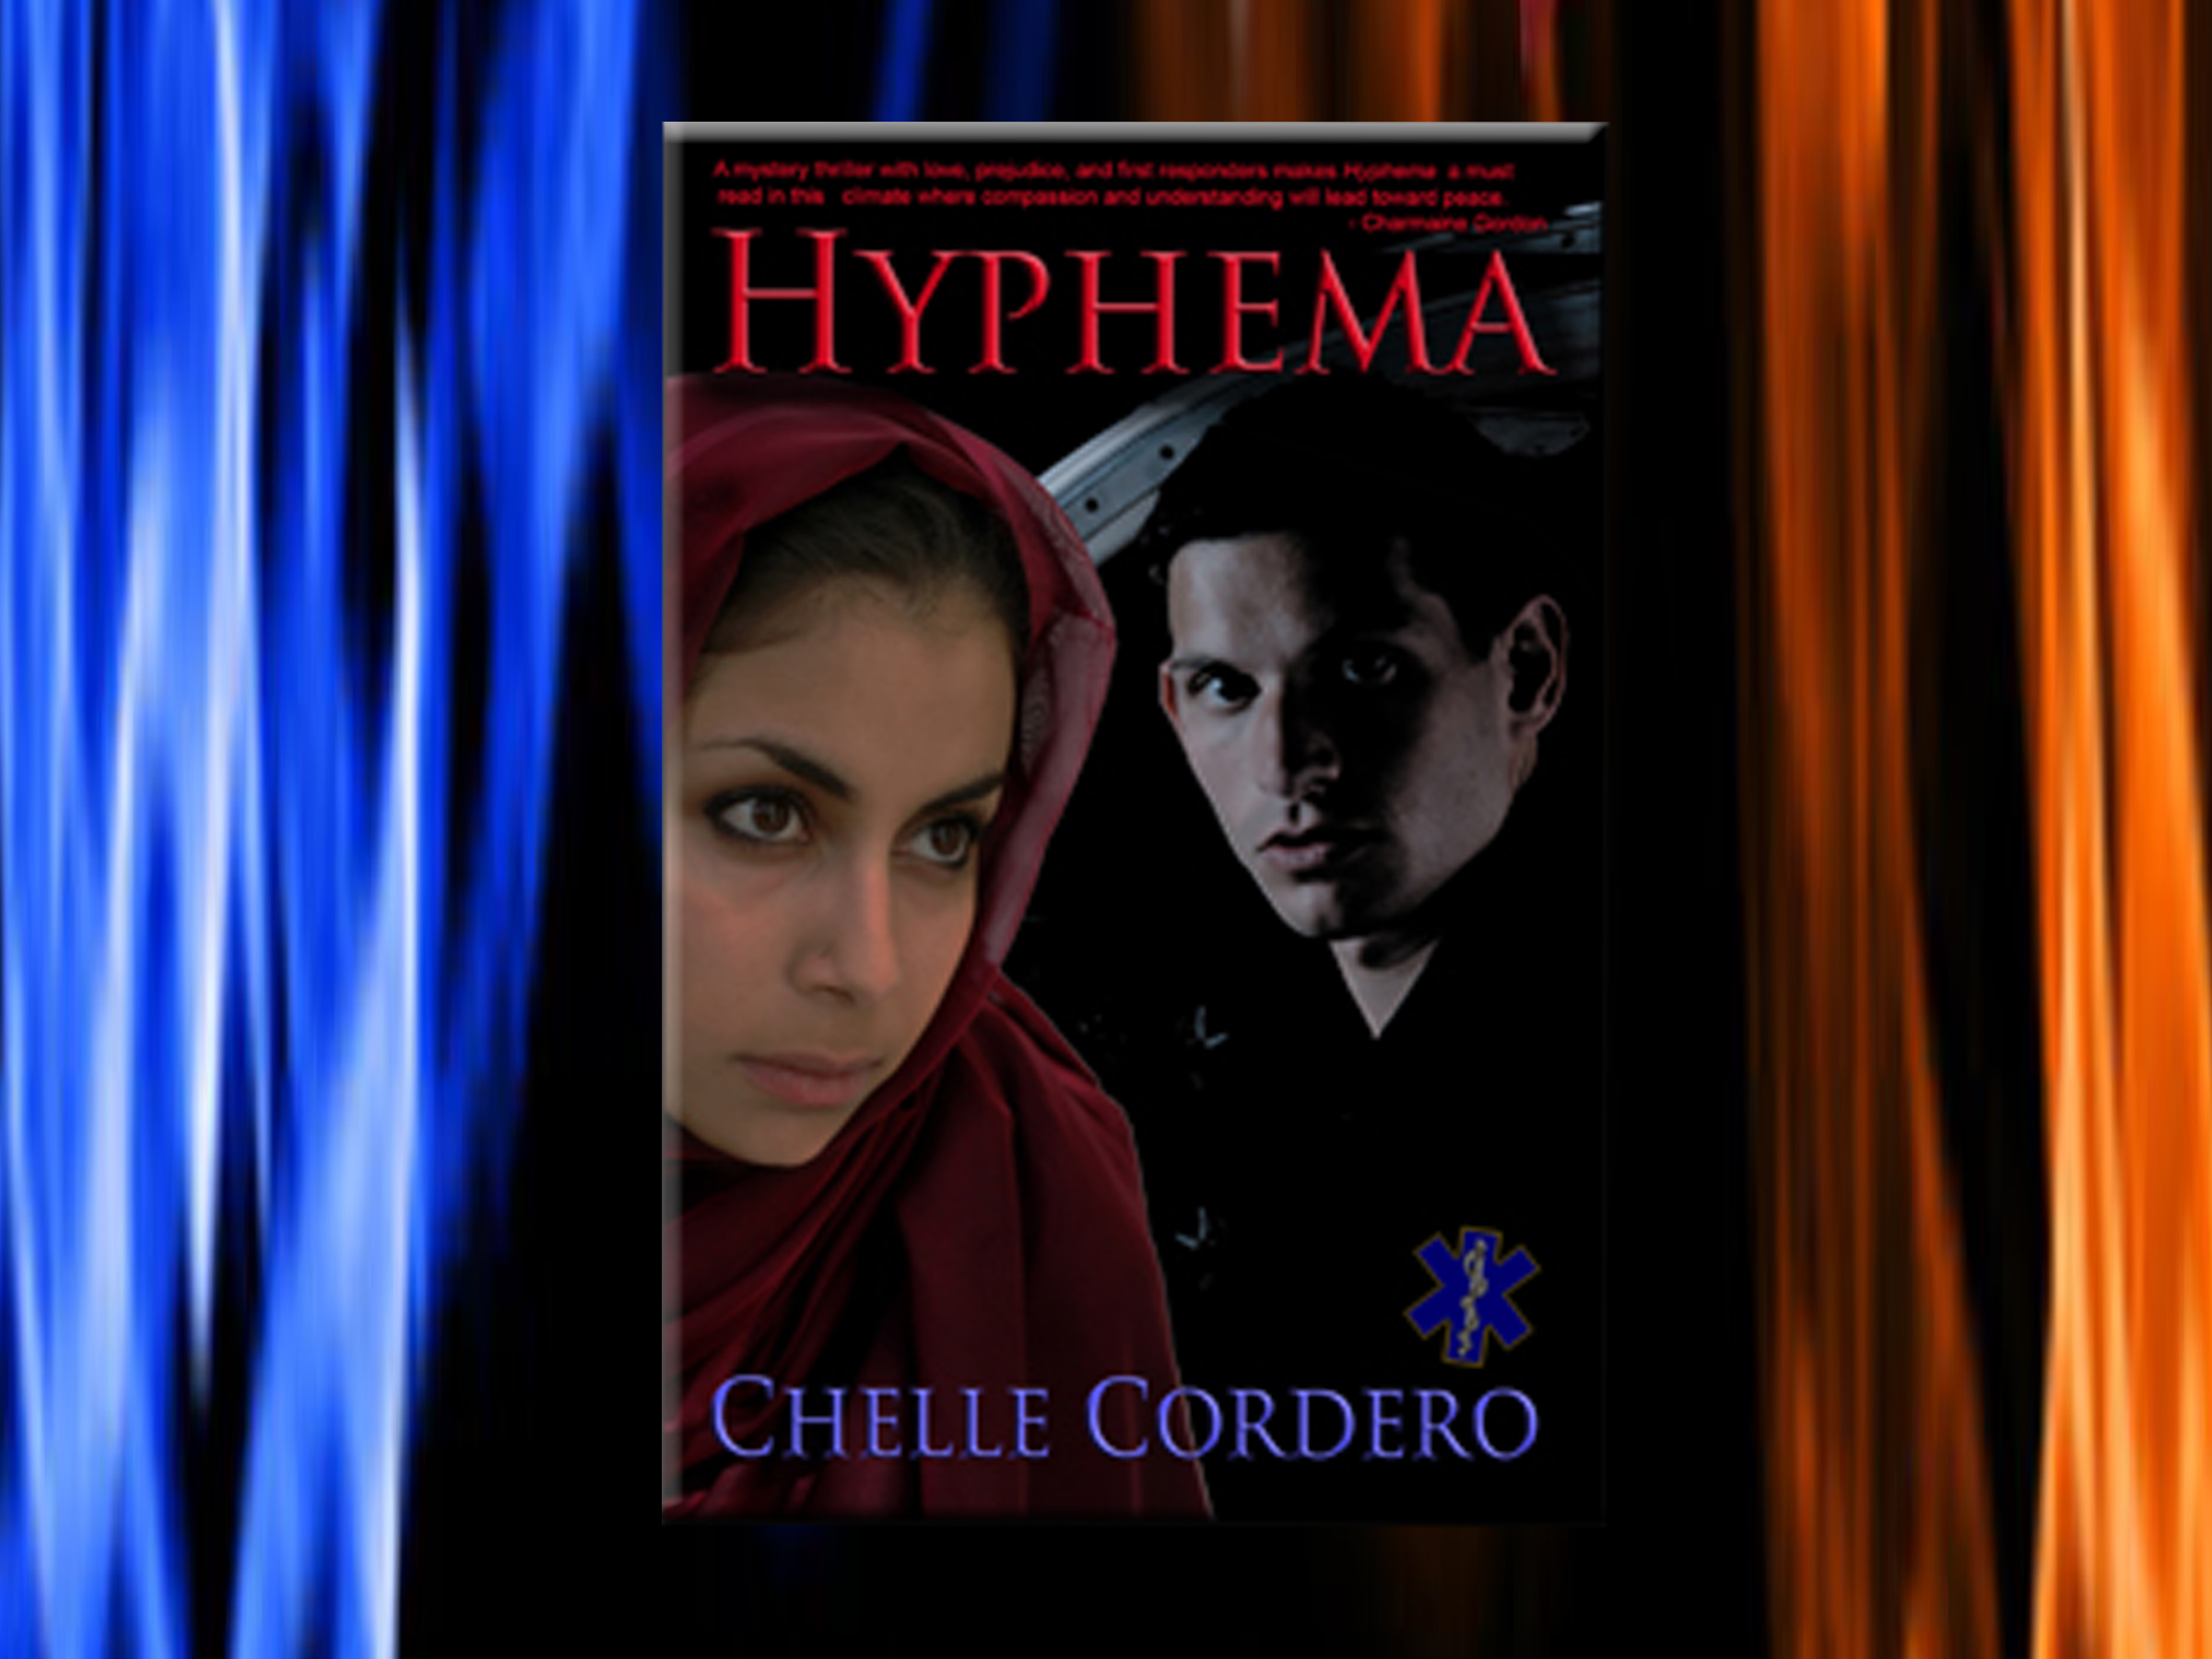 2015 Hyphema  cvr clip for new video